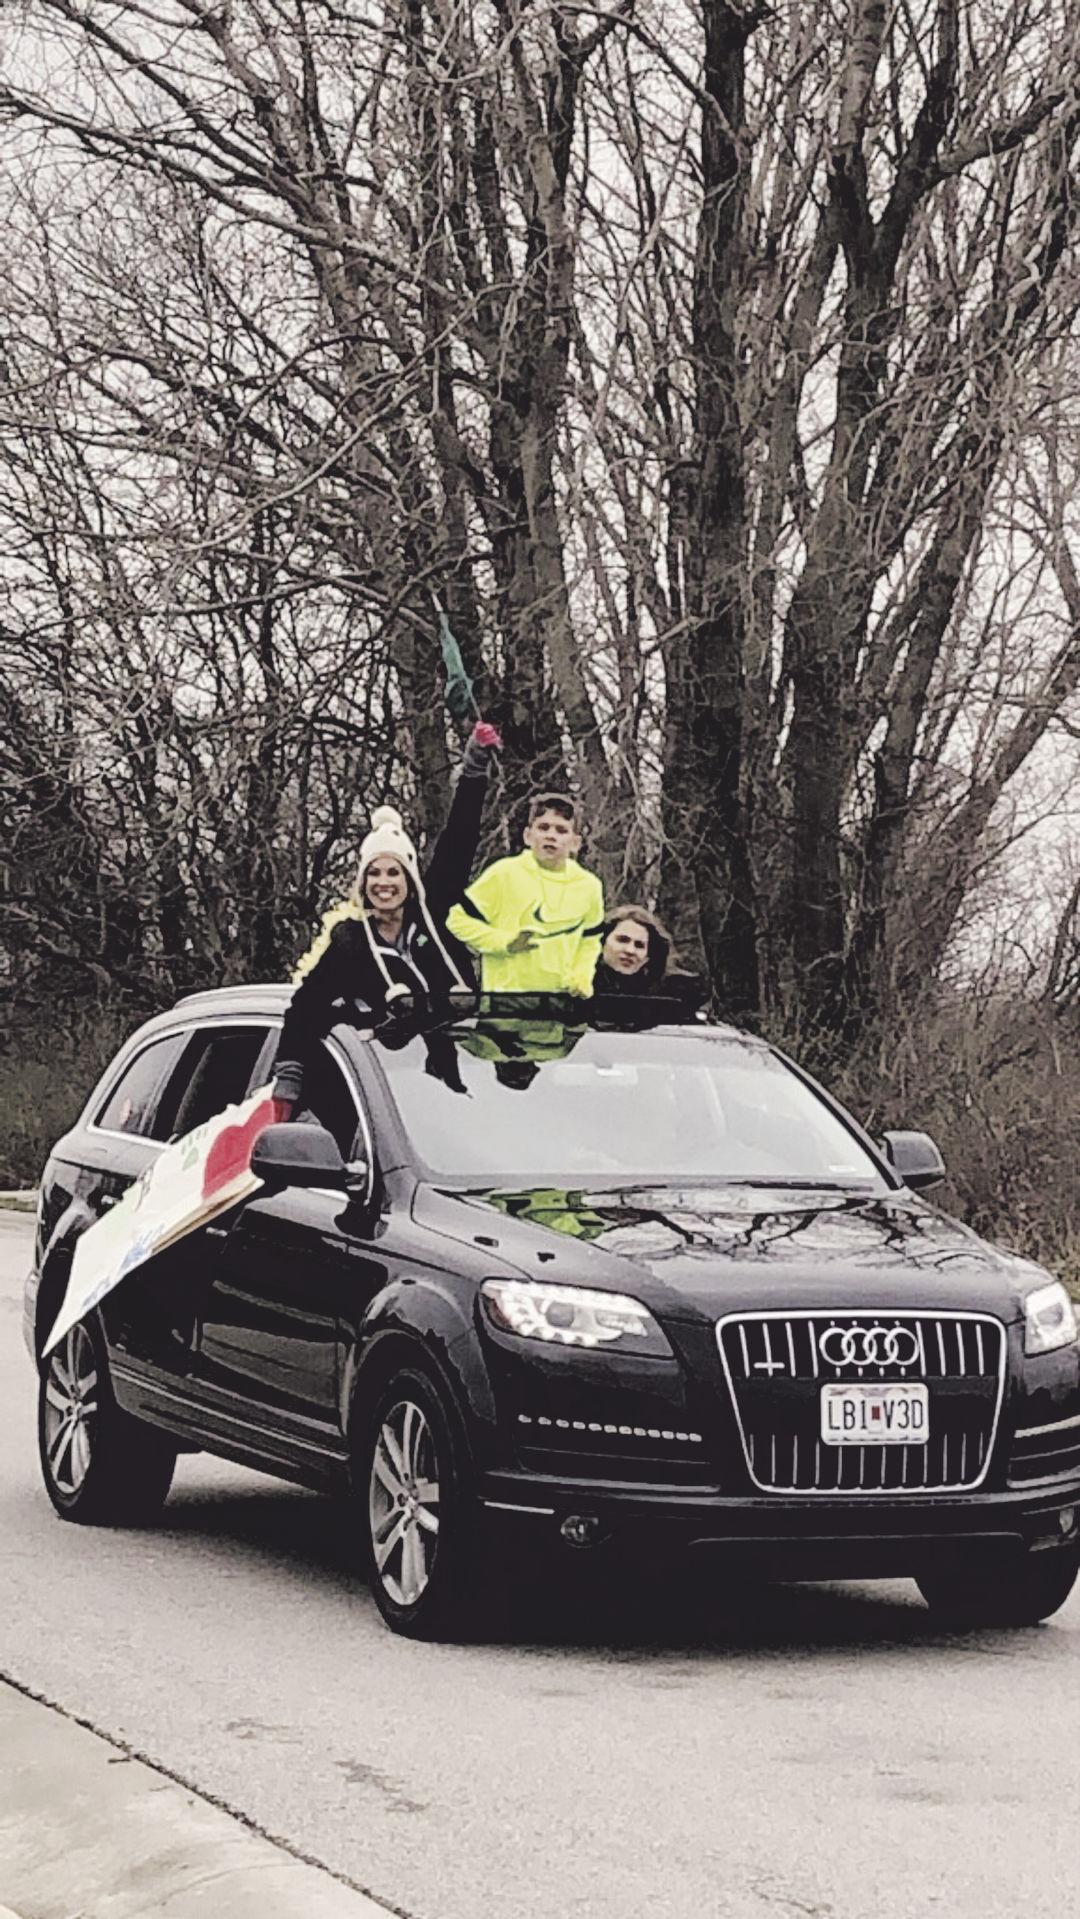 Car parades bring smiles to Northland neighborhoods